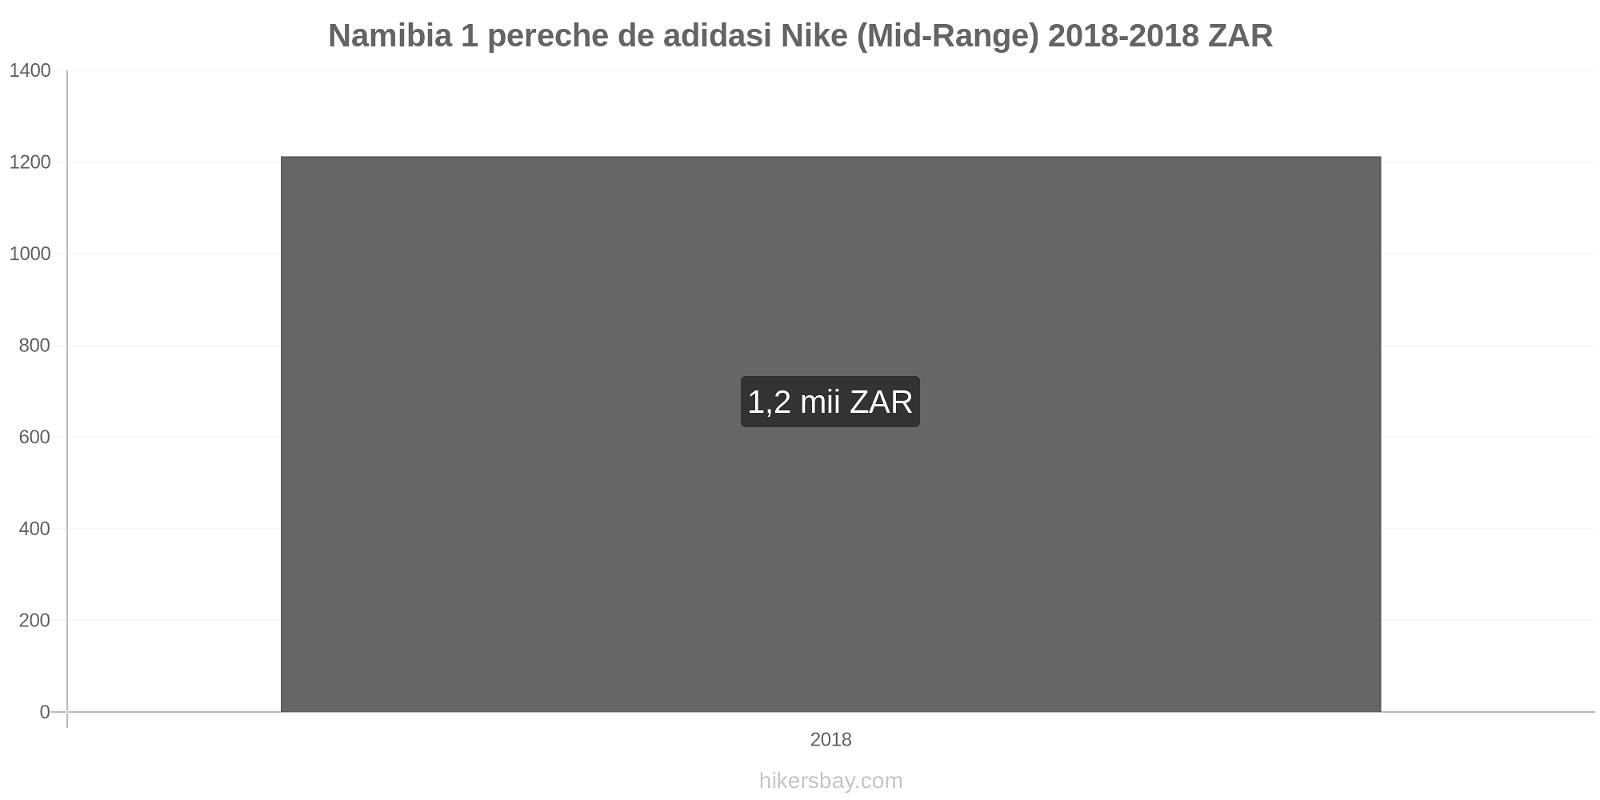 Namibia modificări de preț 1 pereche de adidasi Nike (Mid-Range) hikersbay.com